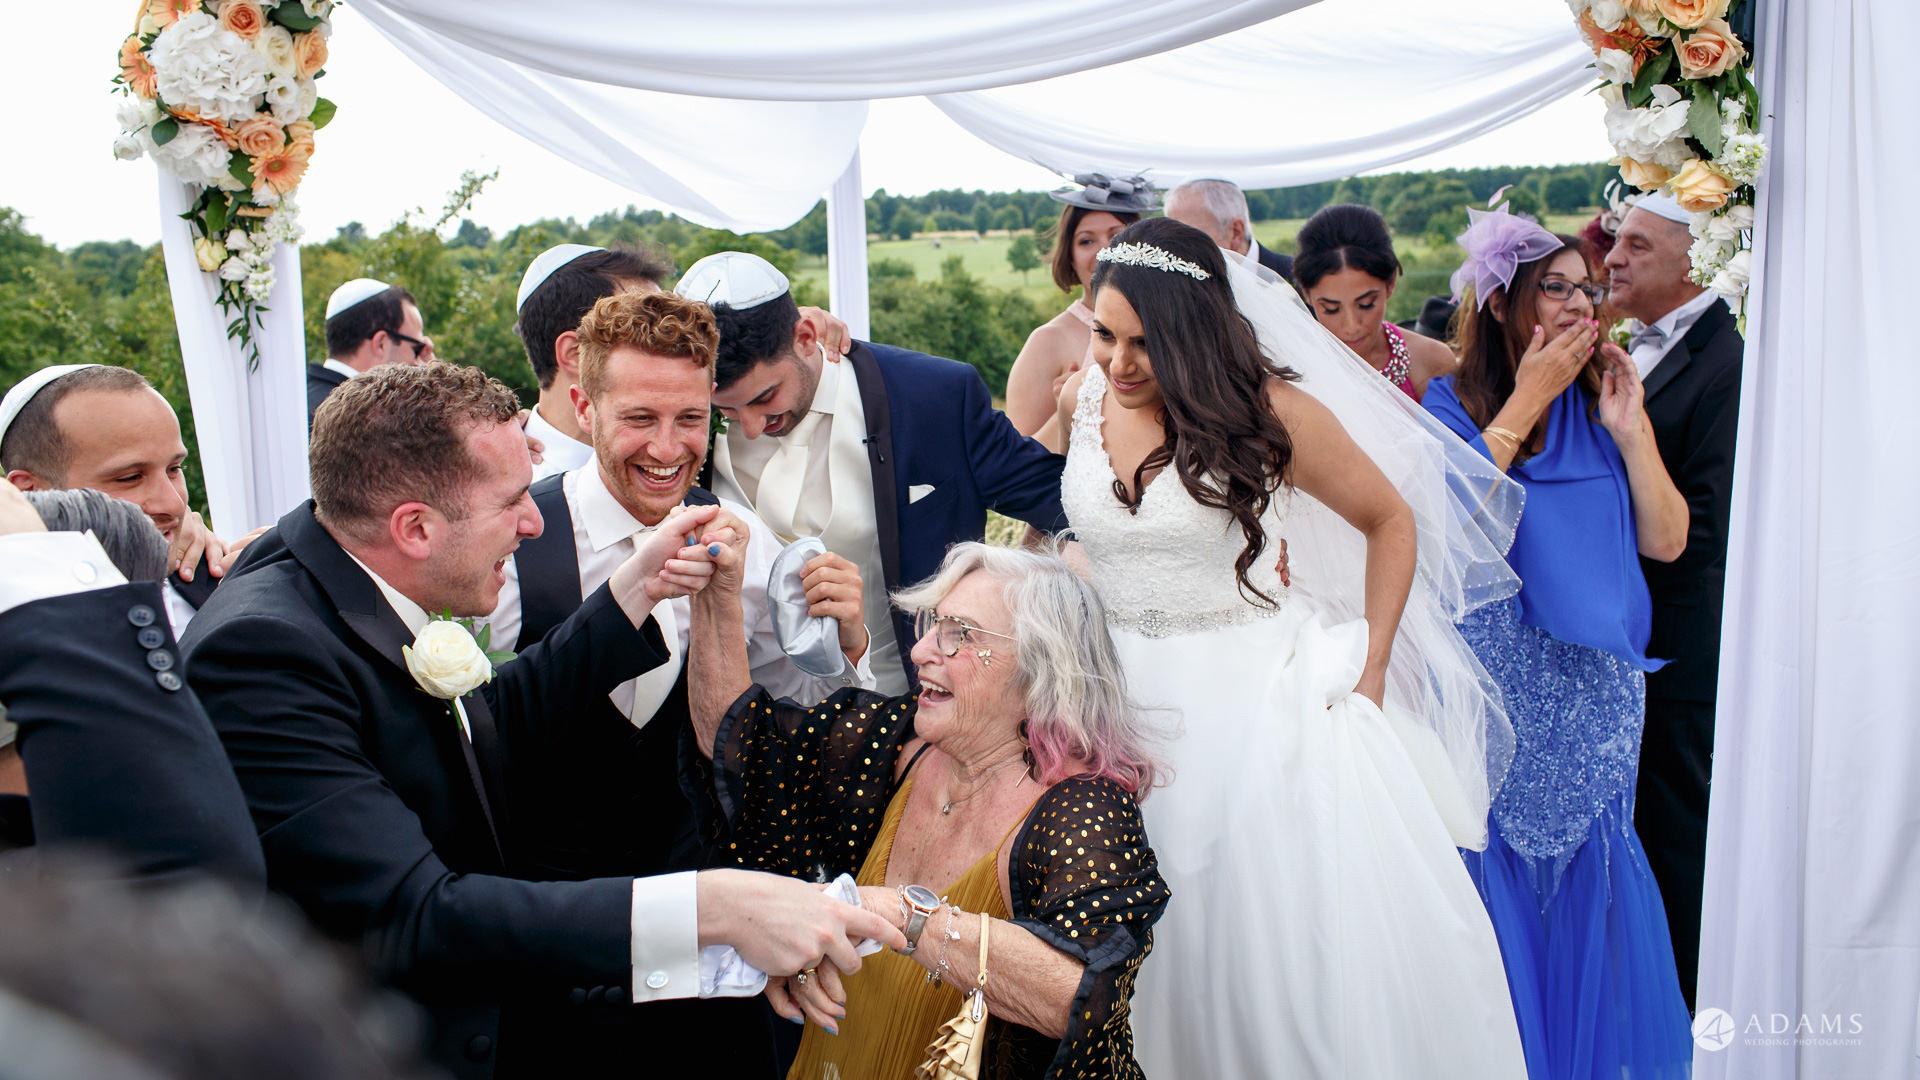 Jewish Wedding at Manor of Groves Wedding Photography   Candice + Doron 93